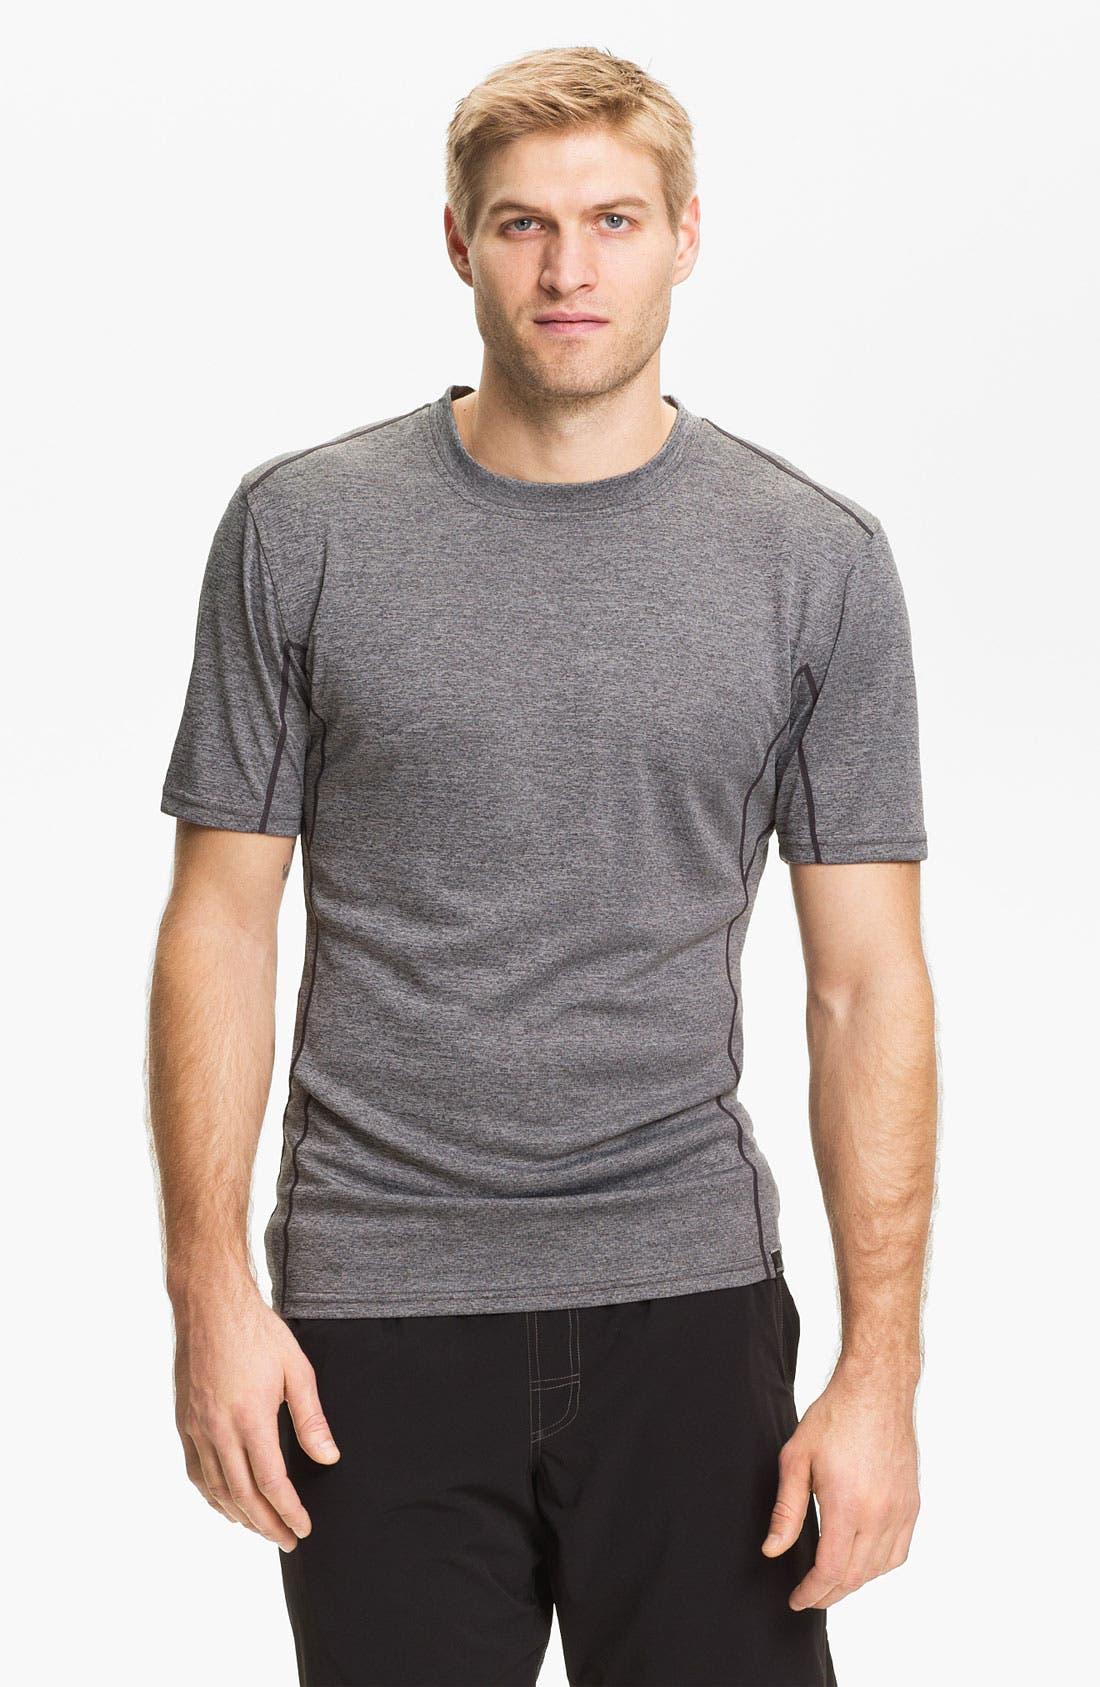 Main Image - prAna 'Talon' Crewneck T-Shirt